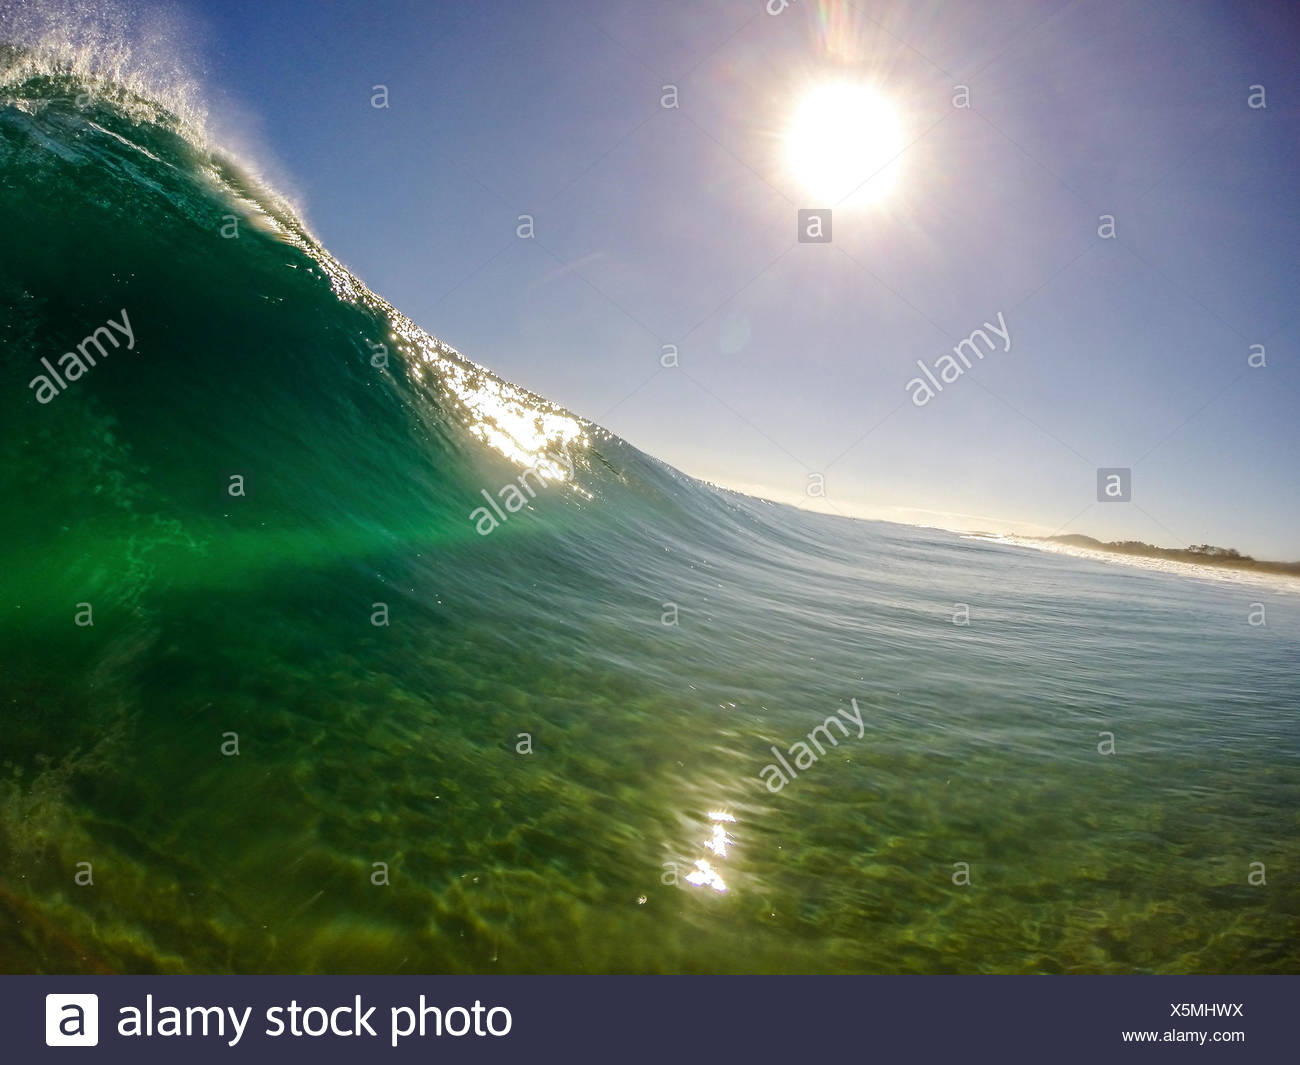 Australien, New South Wales, Welle am schwarzen Felsen Strand Stockbild